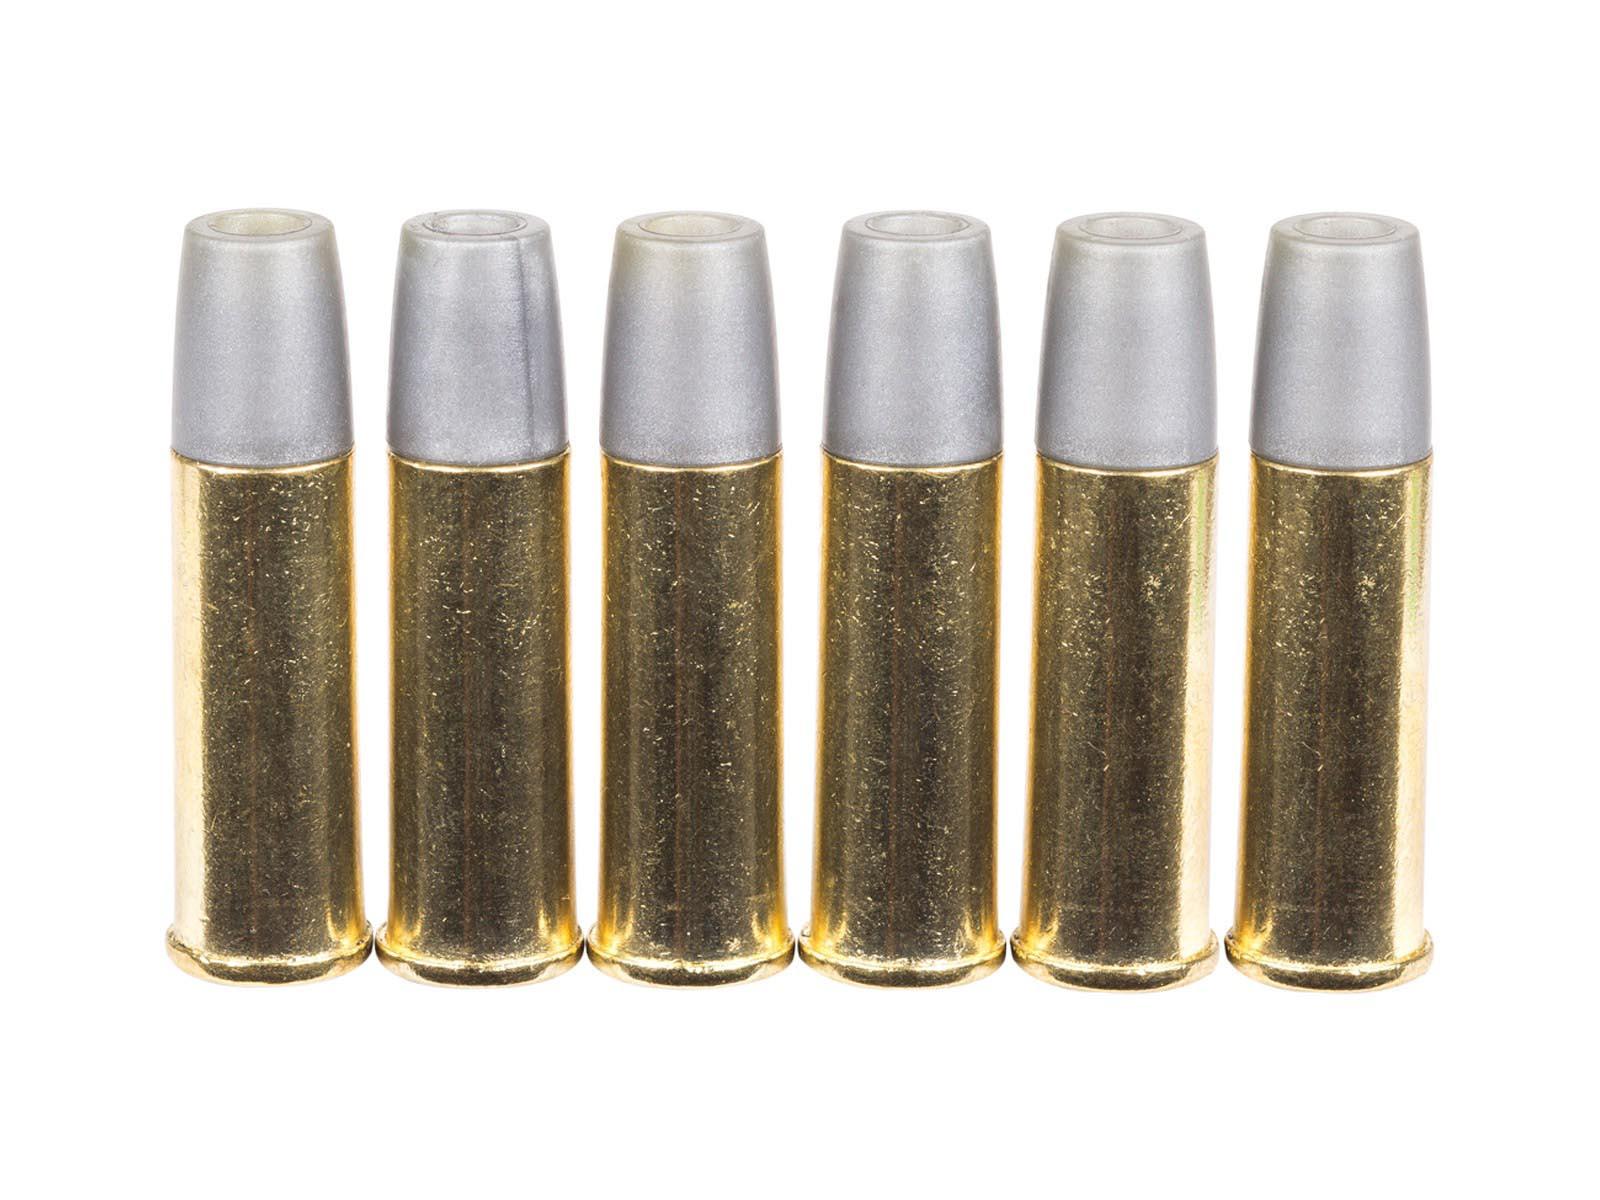 Schofield No. 3 BB Revolver Shells